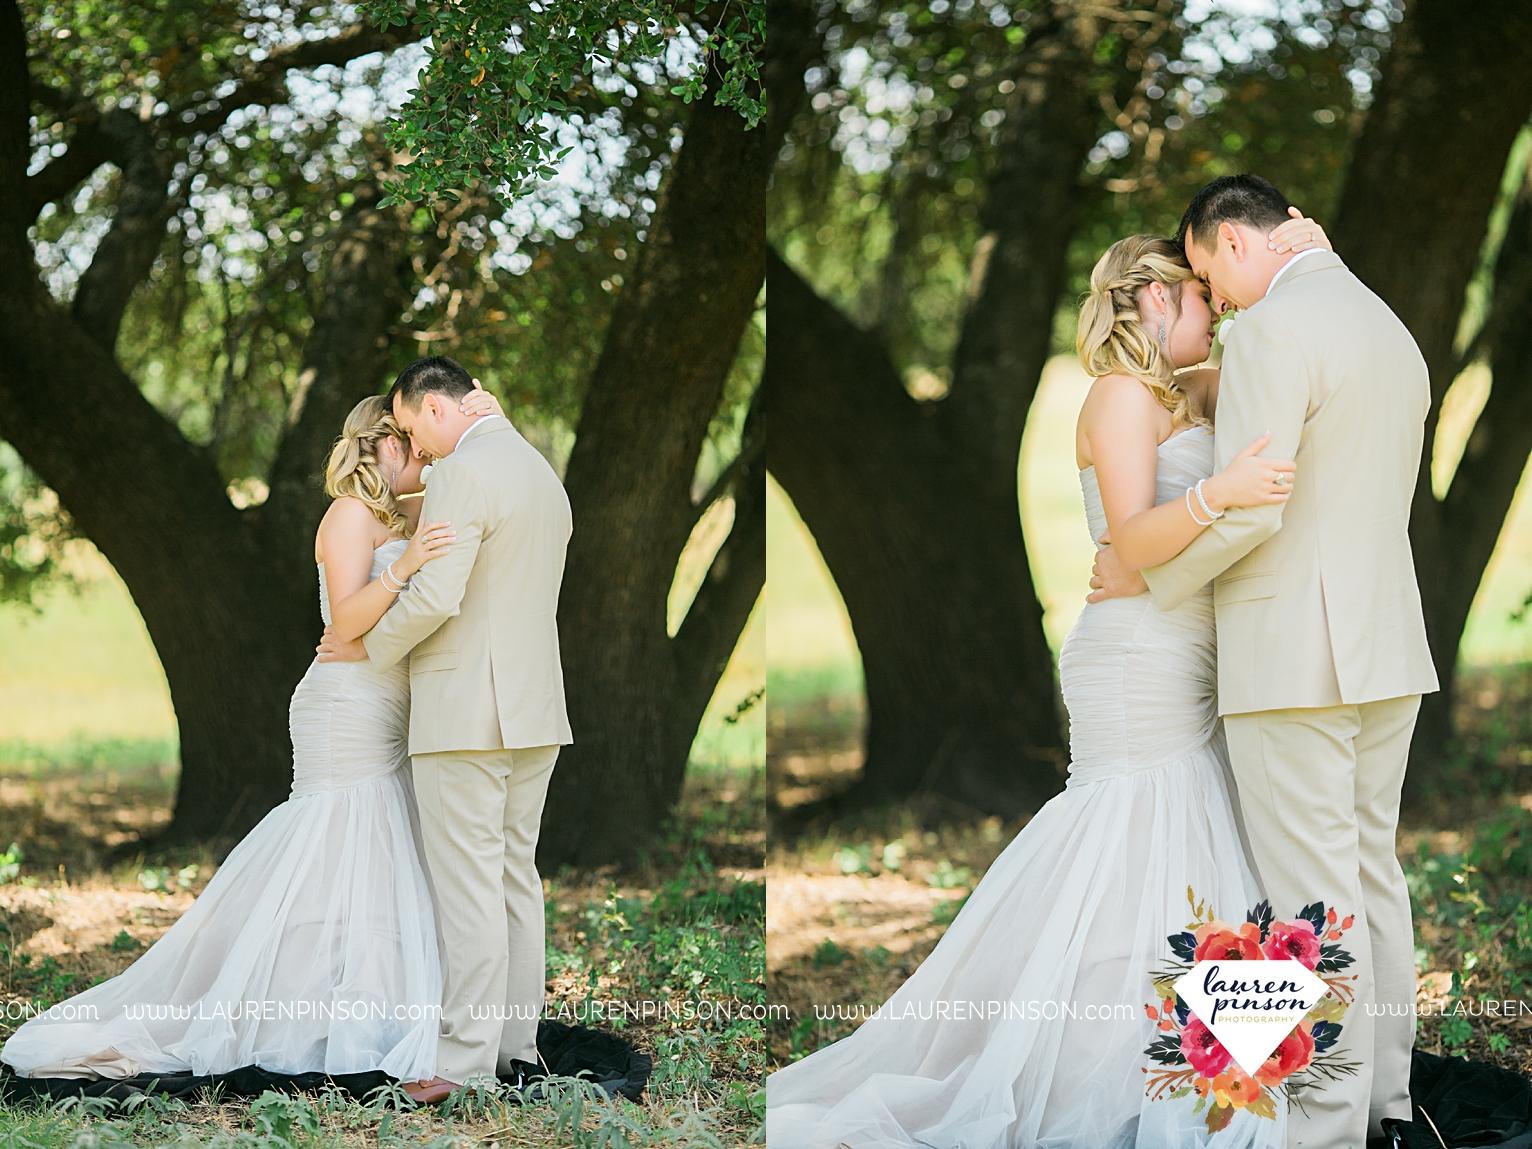 weatherford-texas-hollow-hill-farm-event-wedding-mineral-wells-dfw-wedding-photographer-wichita-falls-photography_3134.jpg